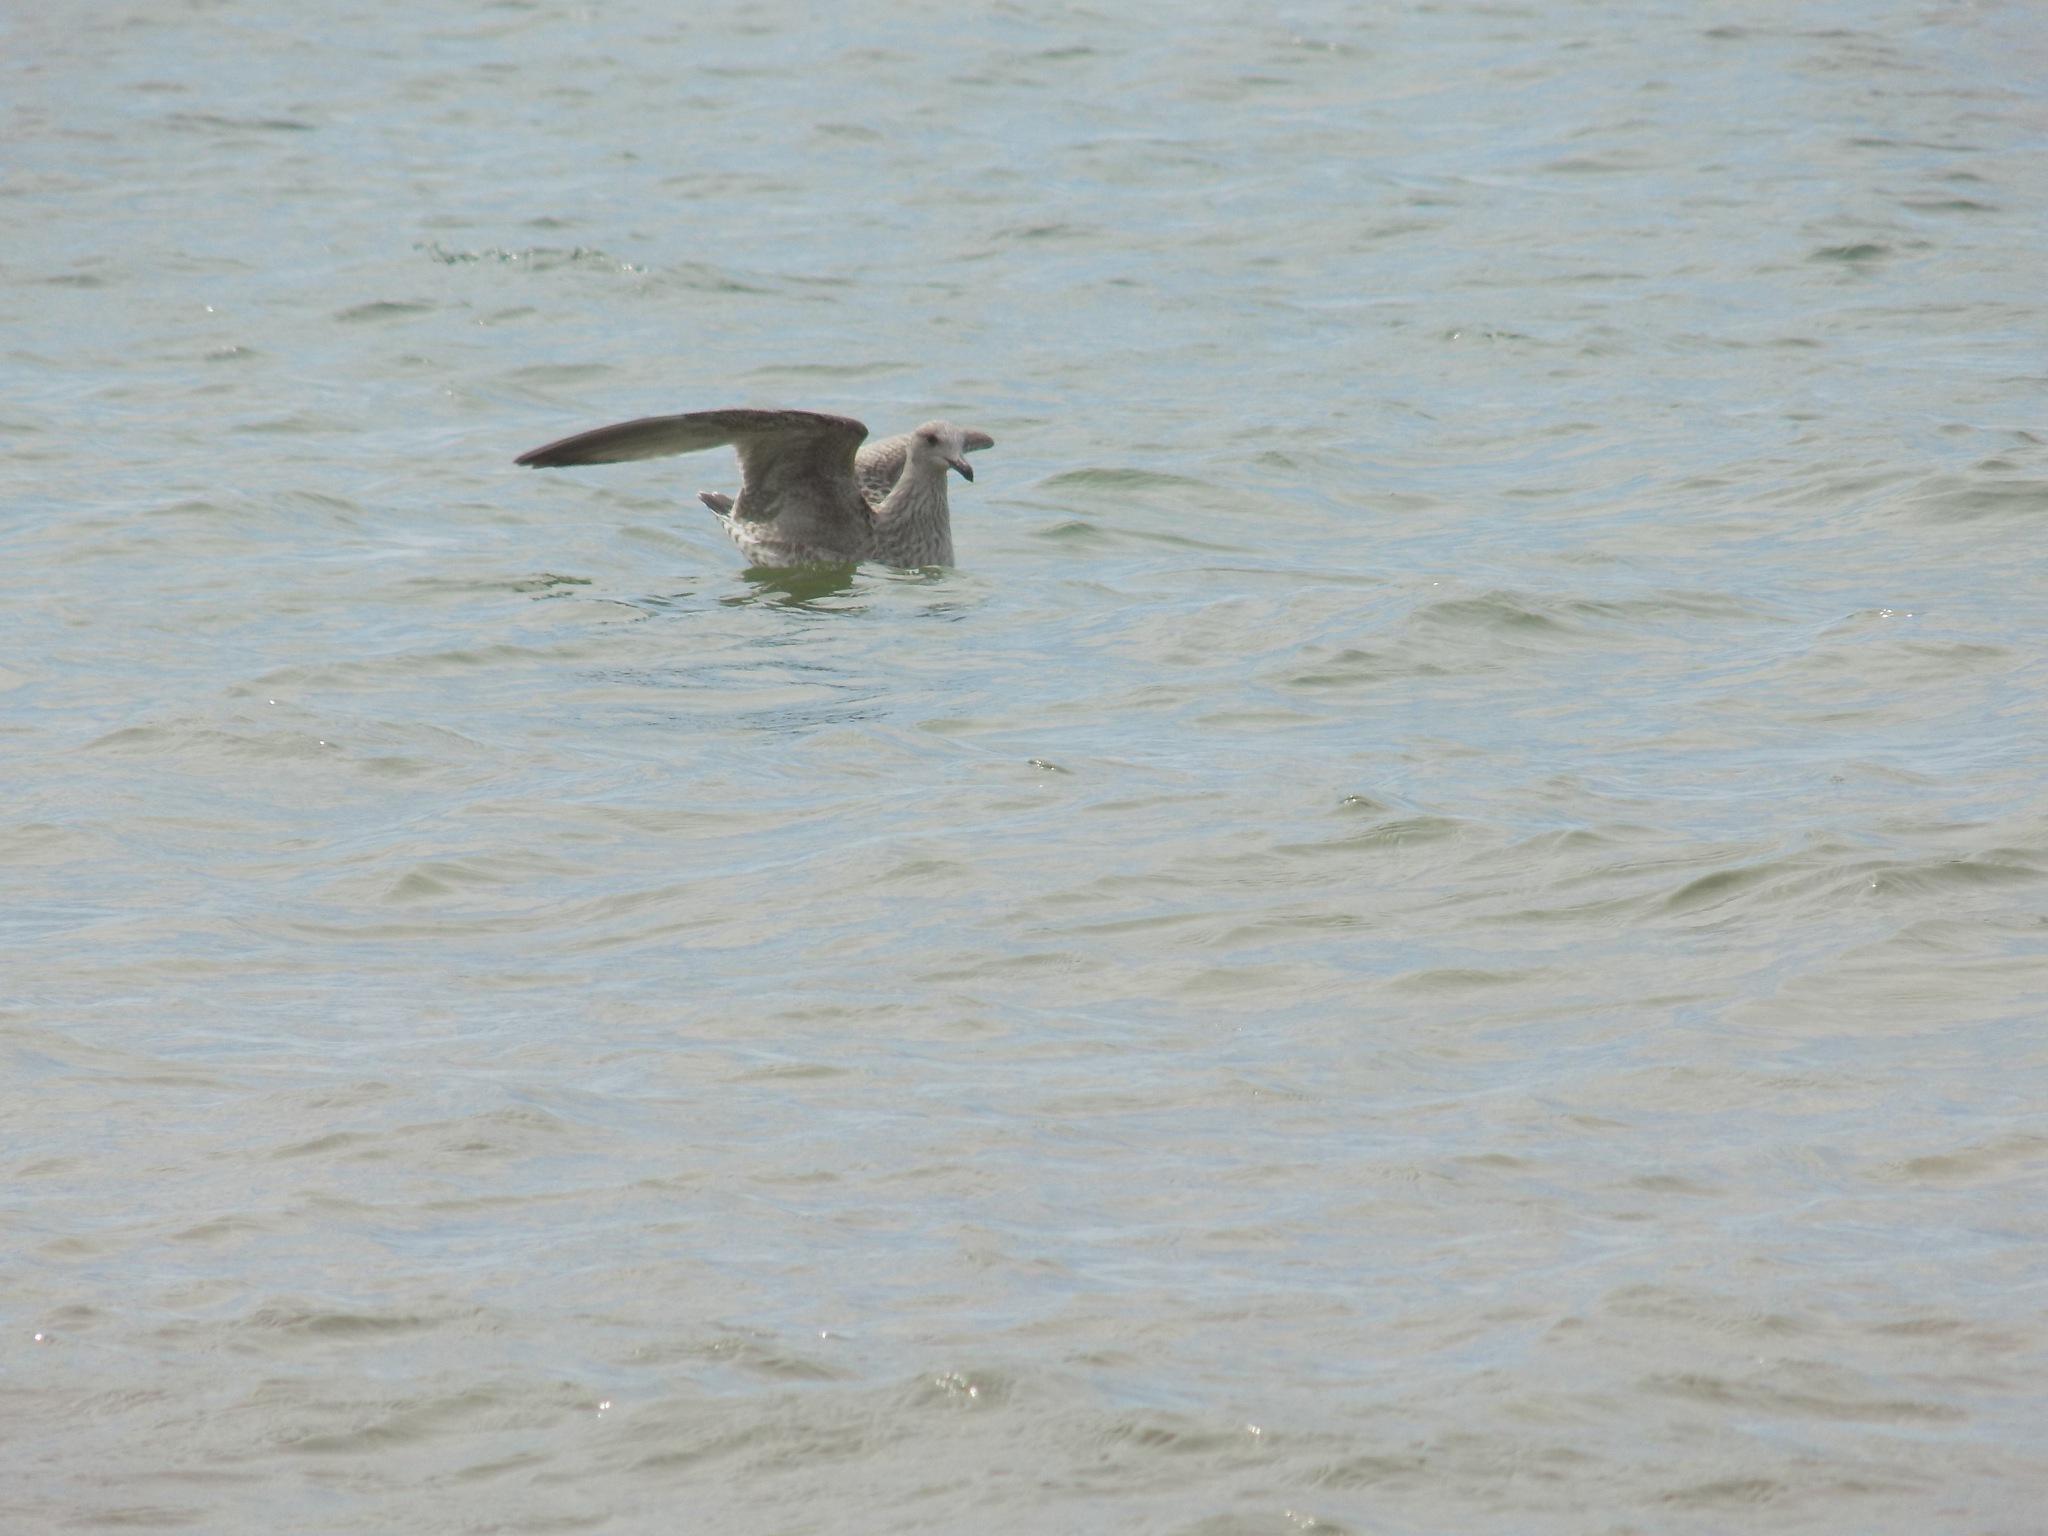 Sea bird by uzkuraitiene62